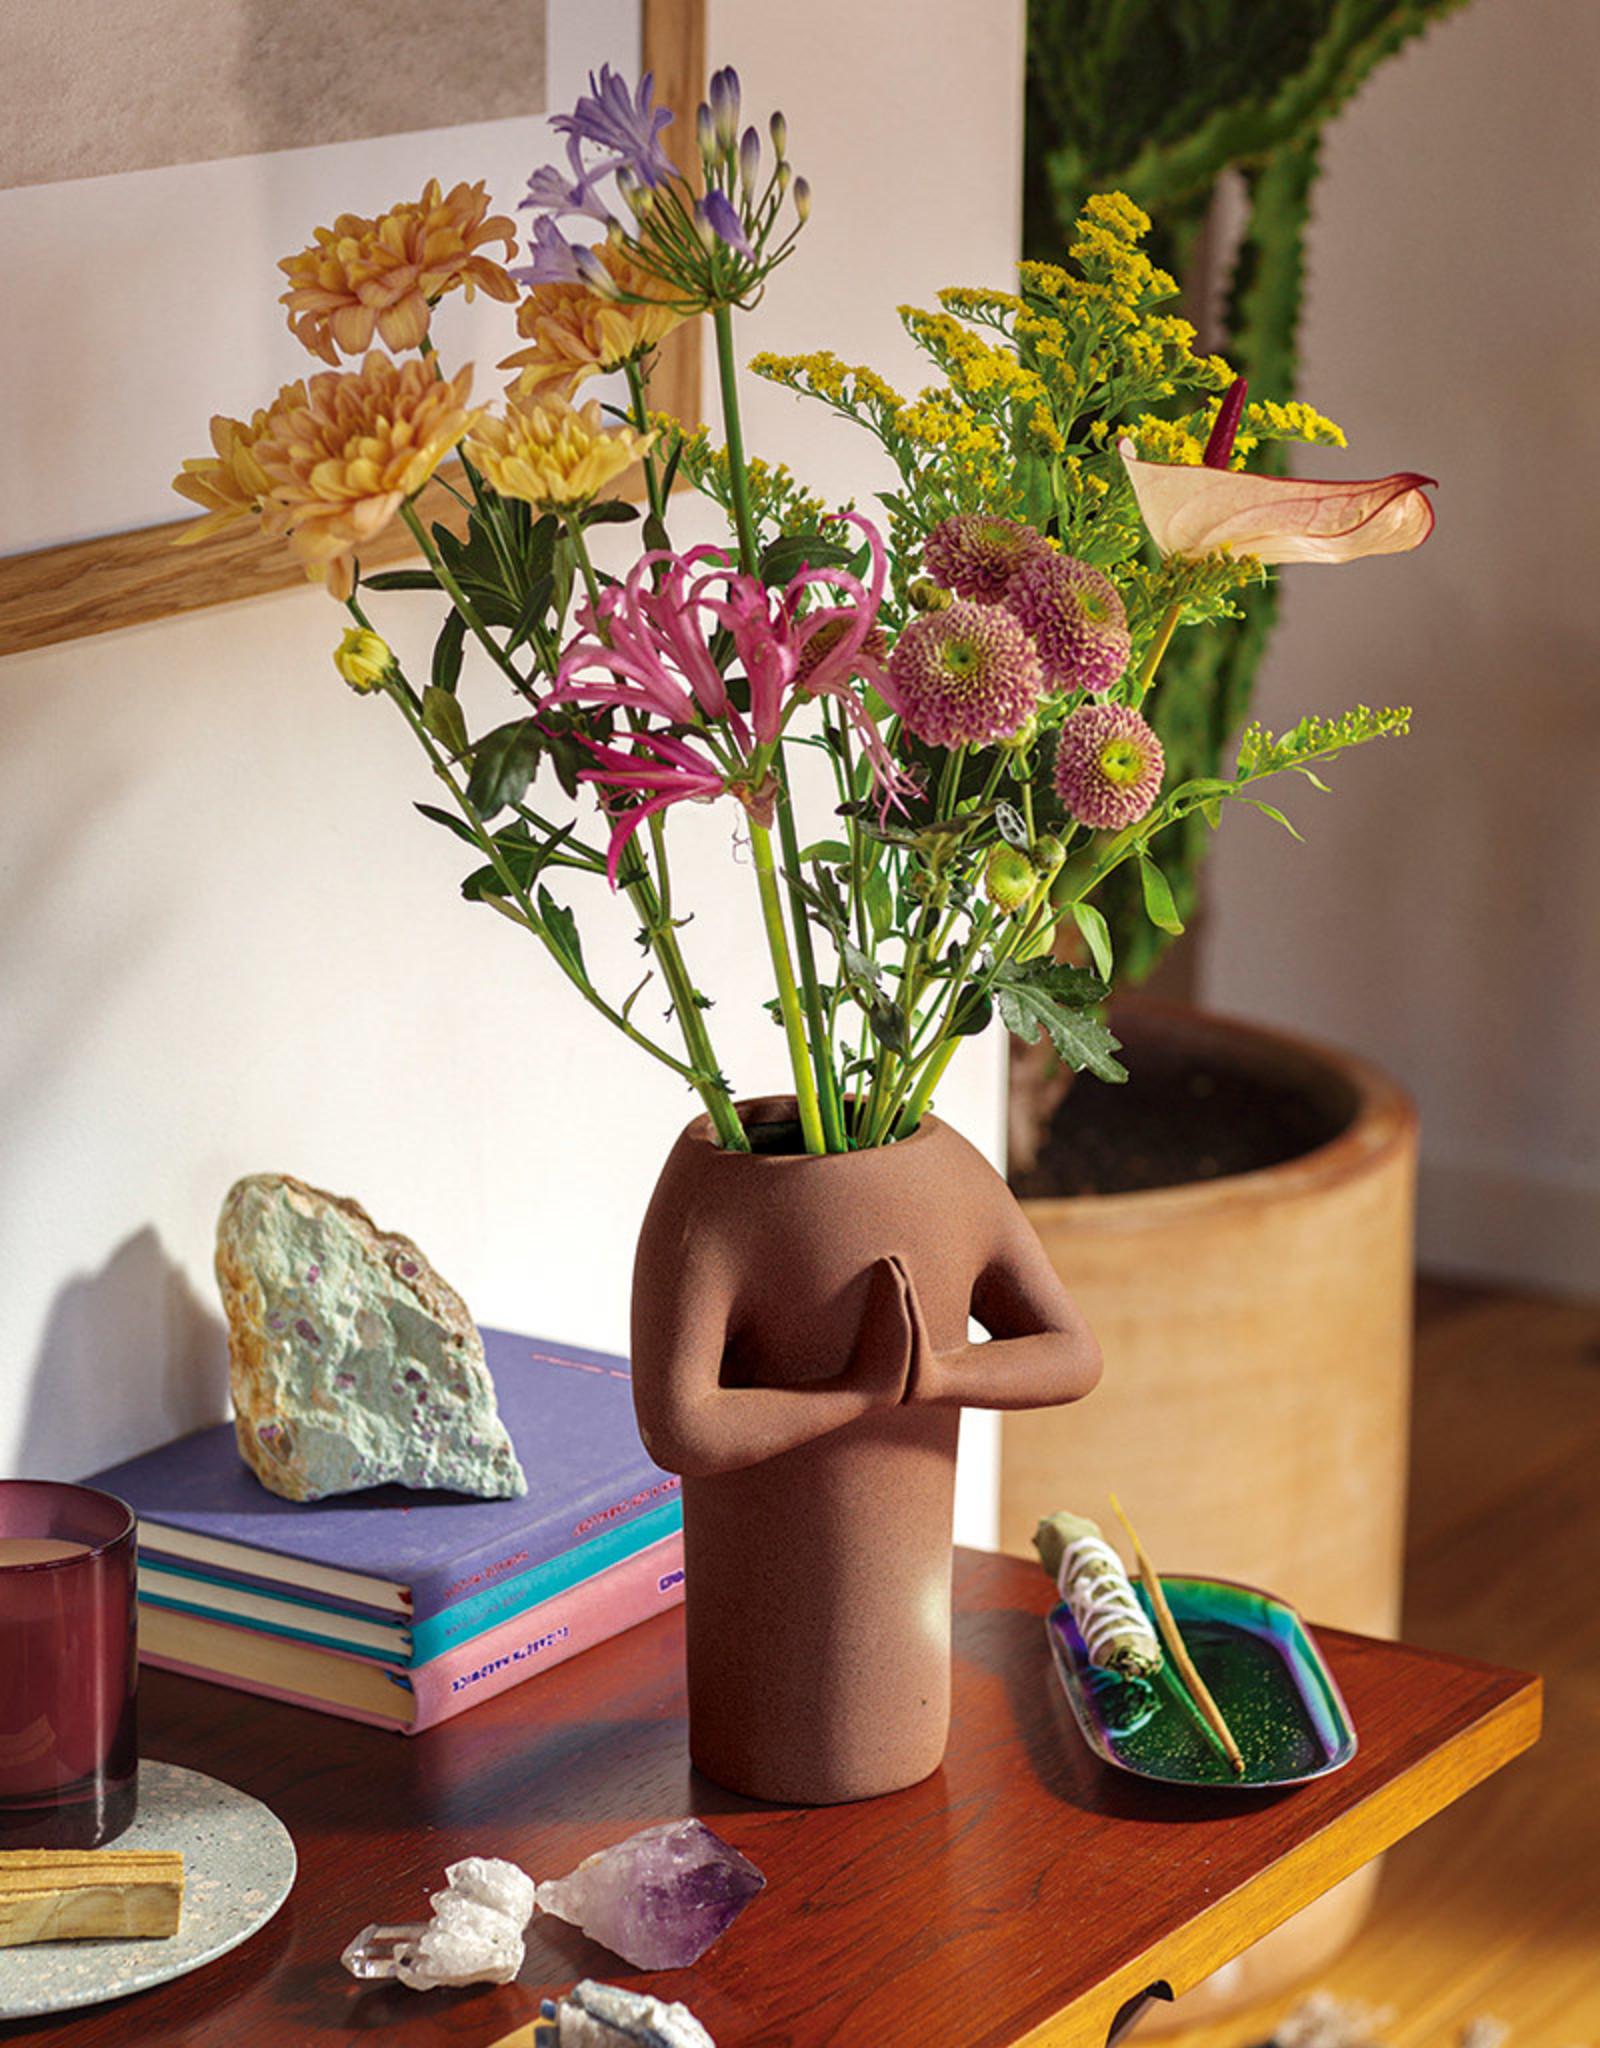 DOIY Vase - Namaste